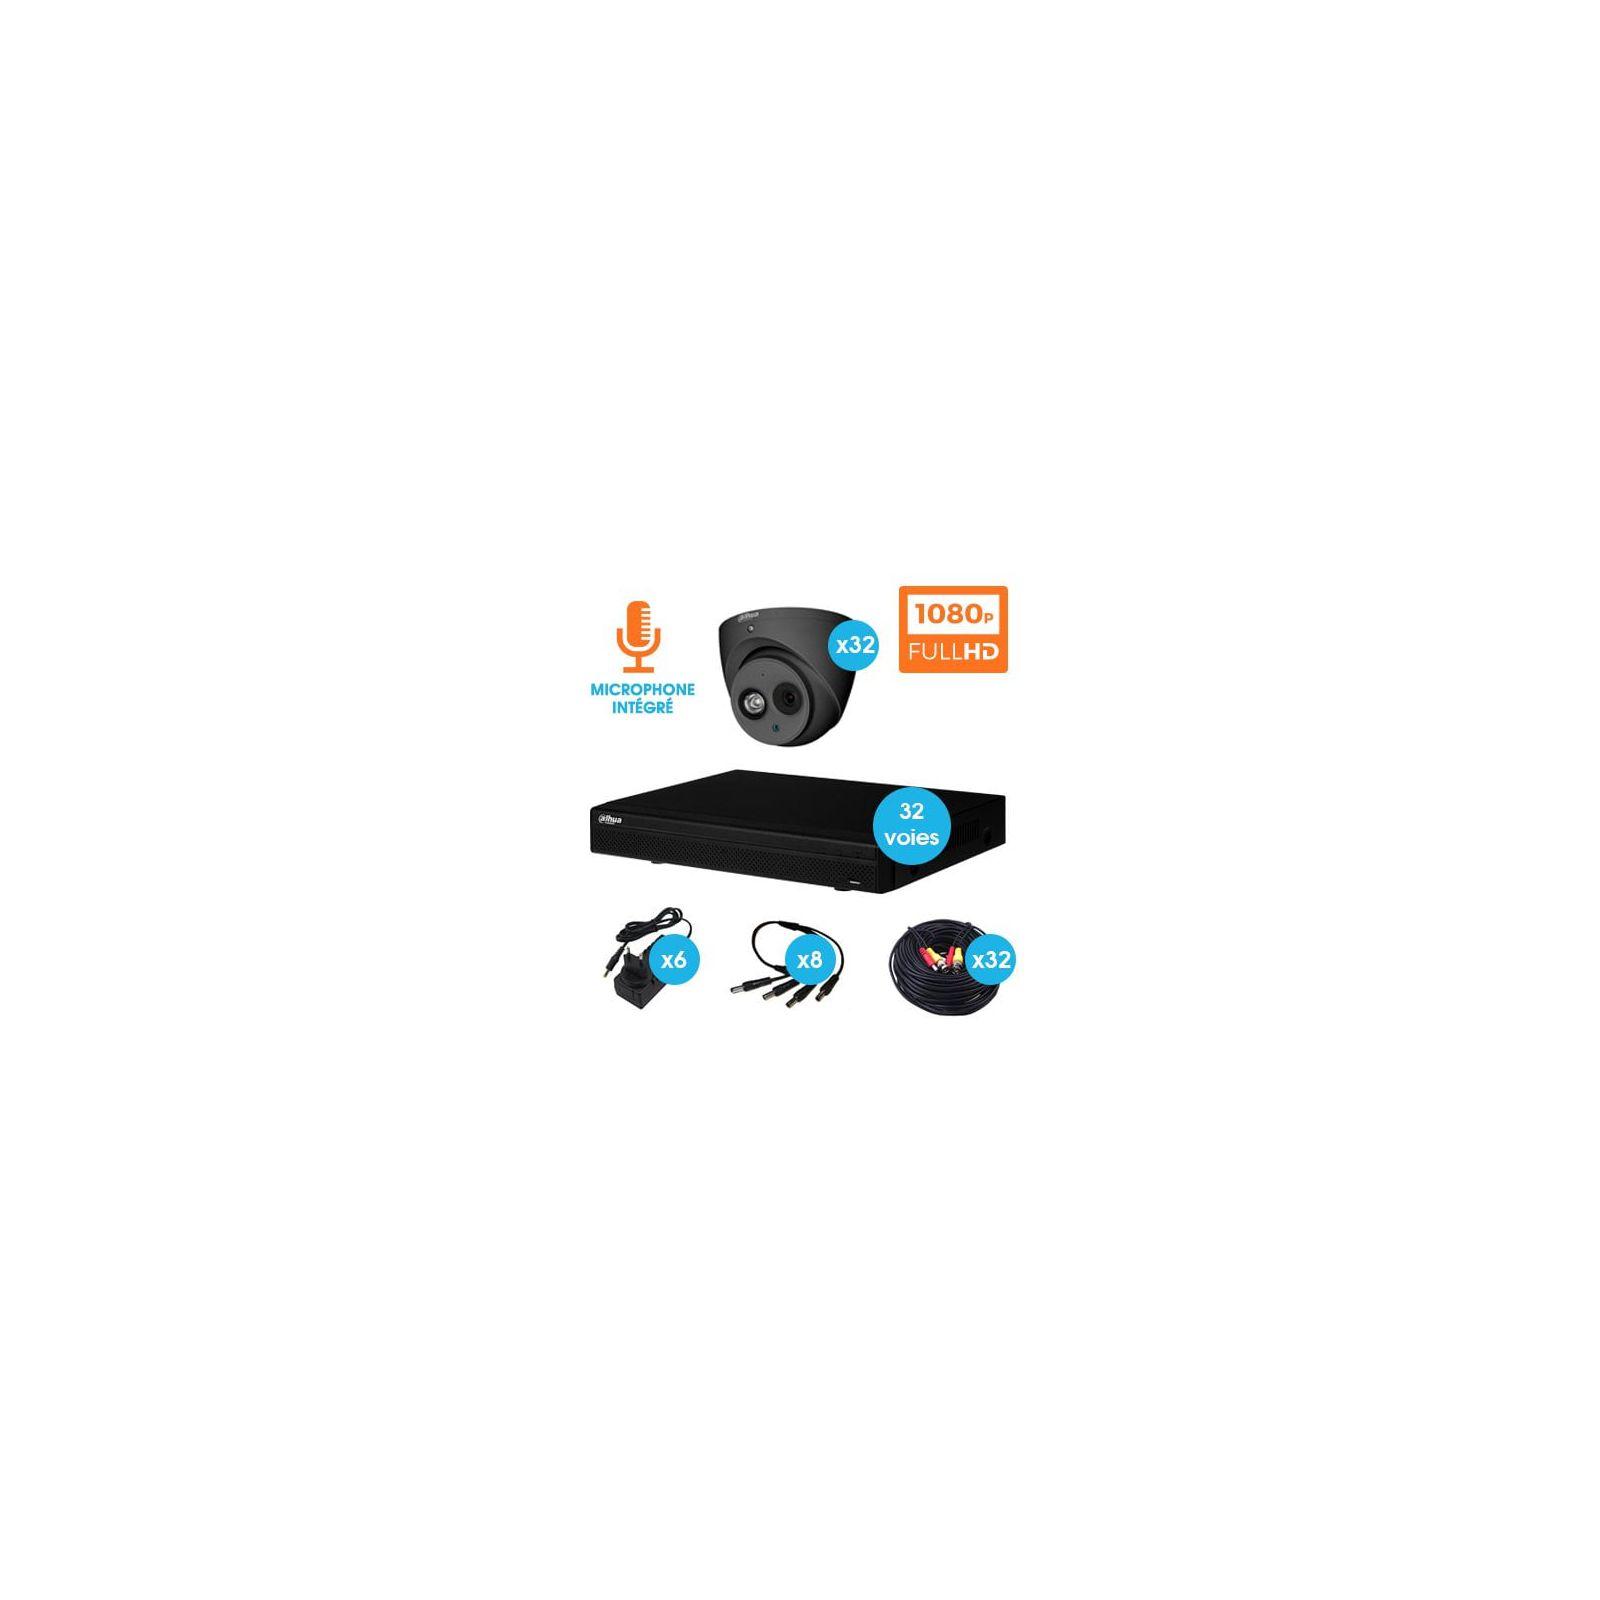 KIT VIDEOSURVEILLANCE DAHUA 32 CAMERAS DOME HDCVI 1080 P DARK GREY AVEC MICRO